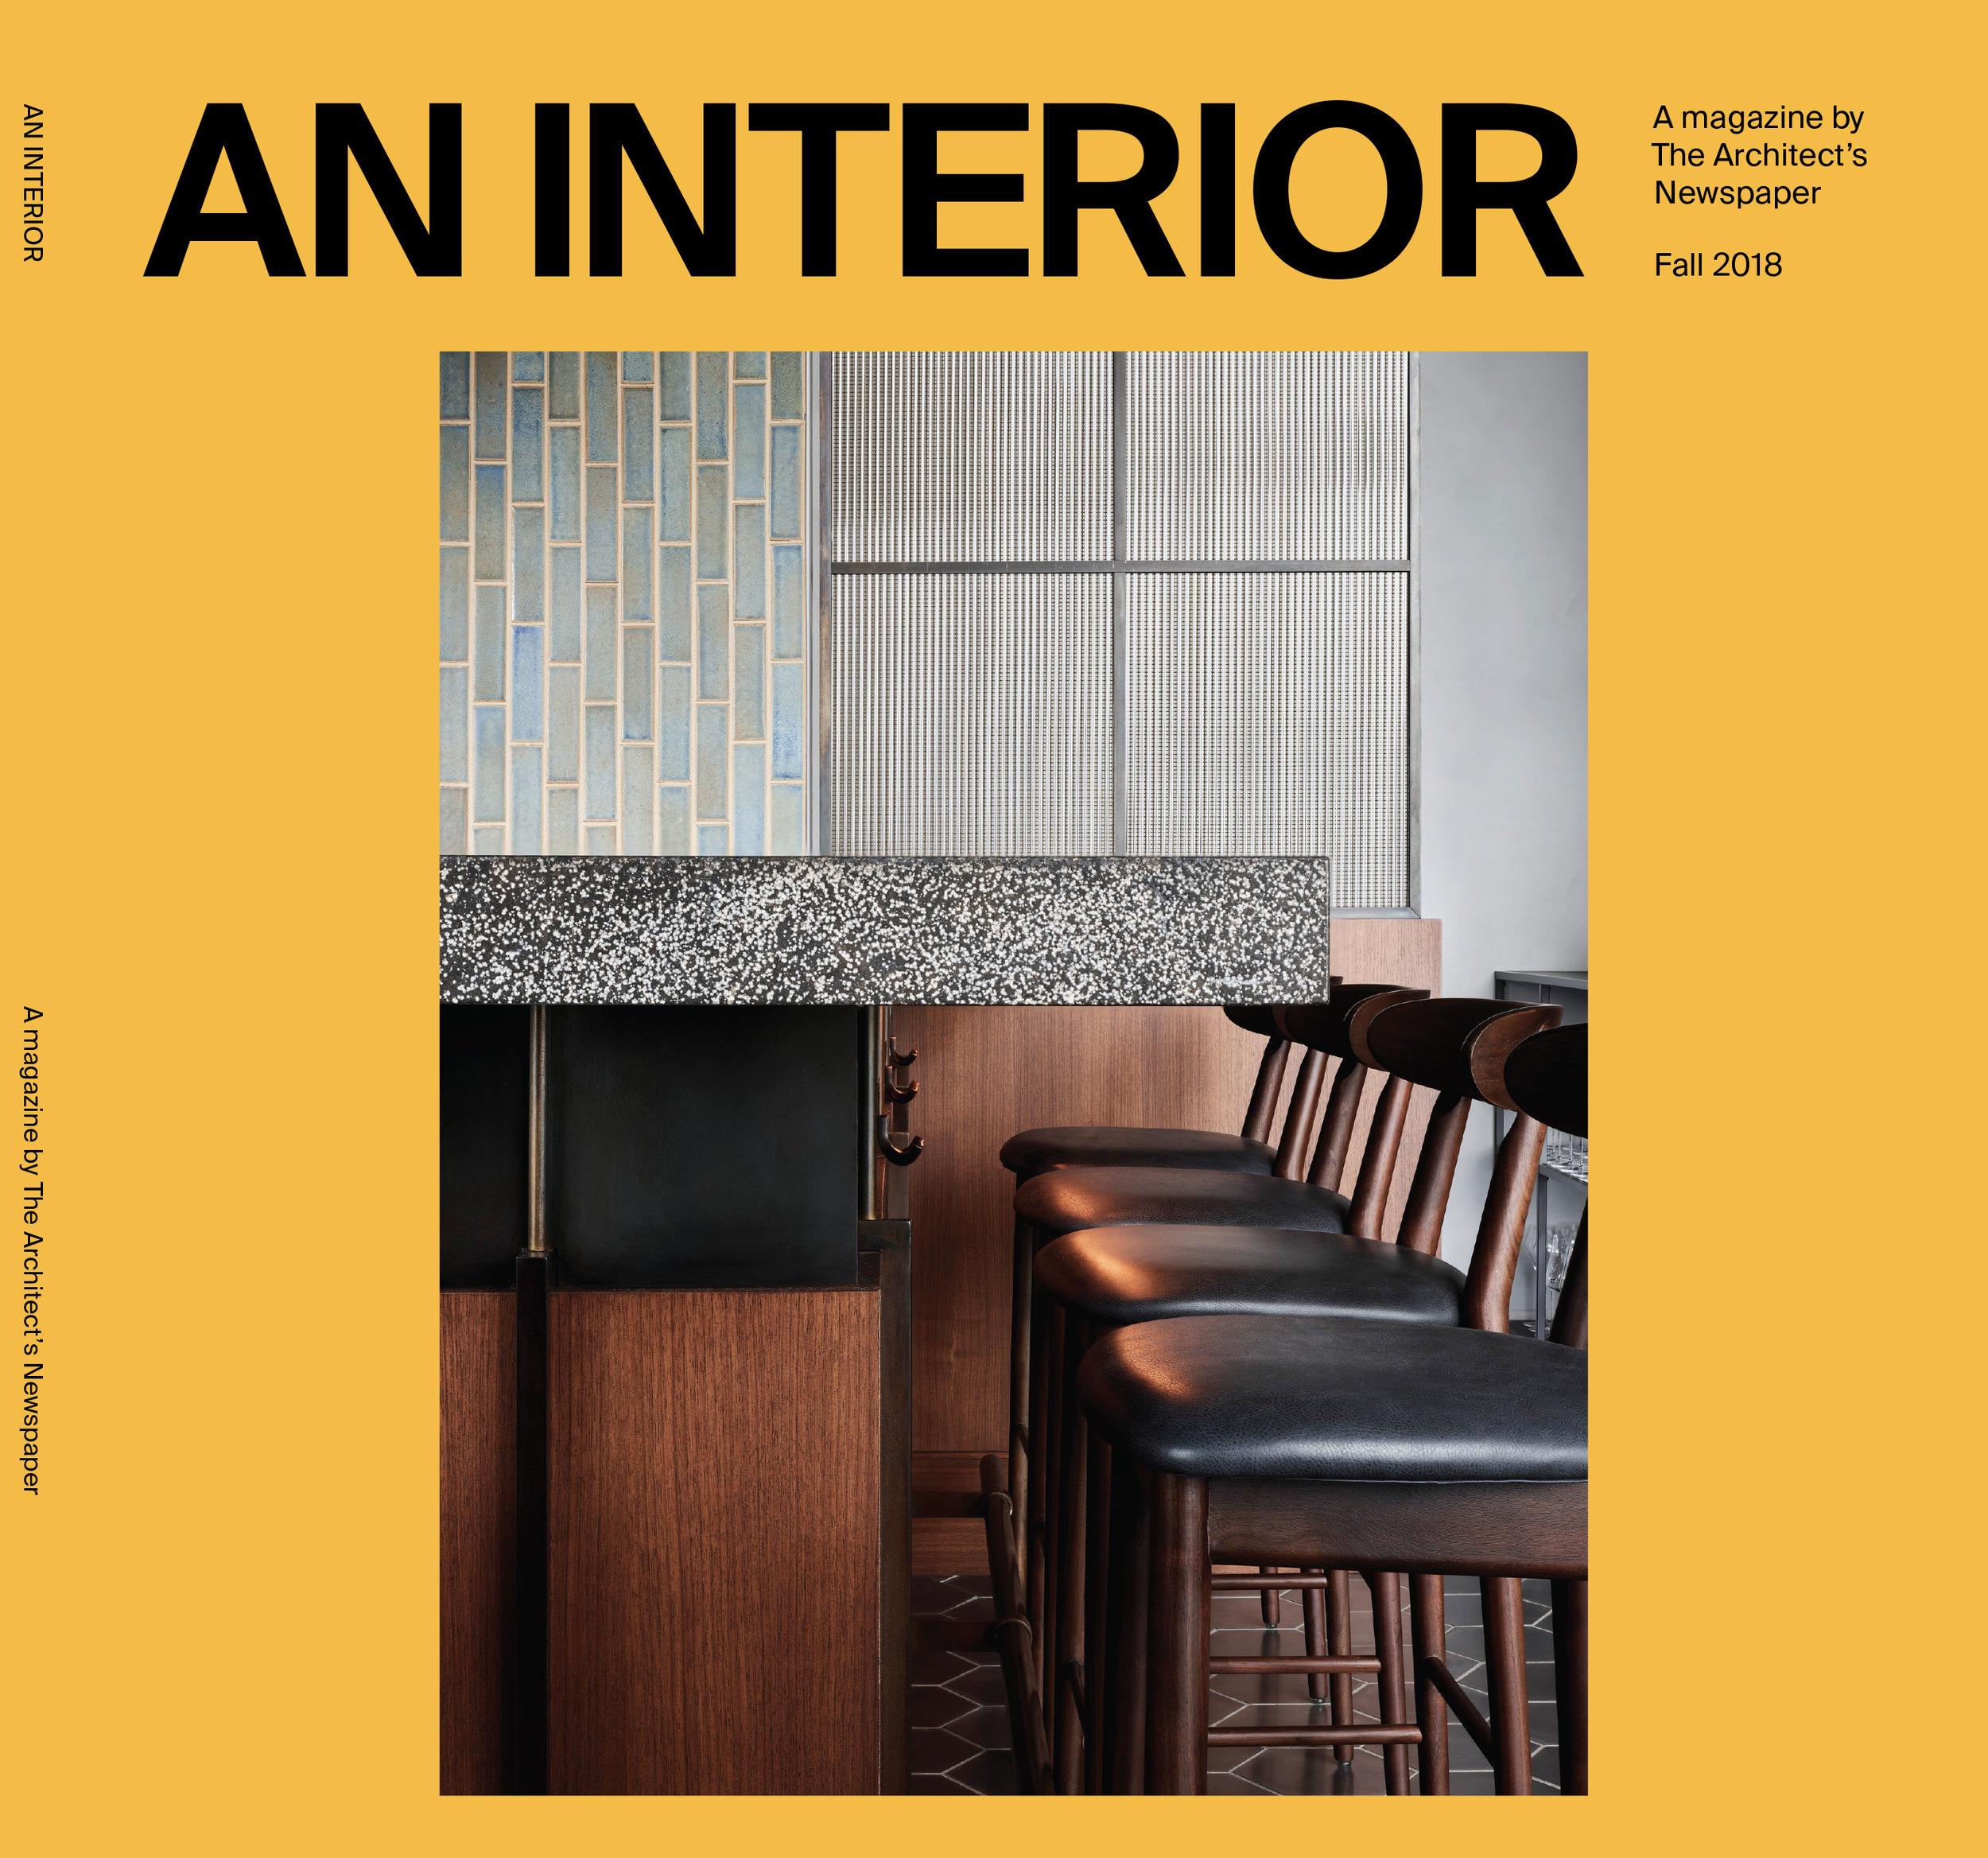 An Interior magazine, Fall 2018